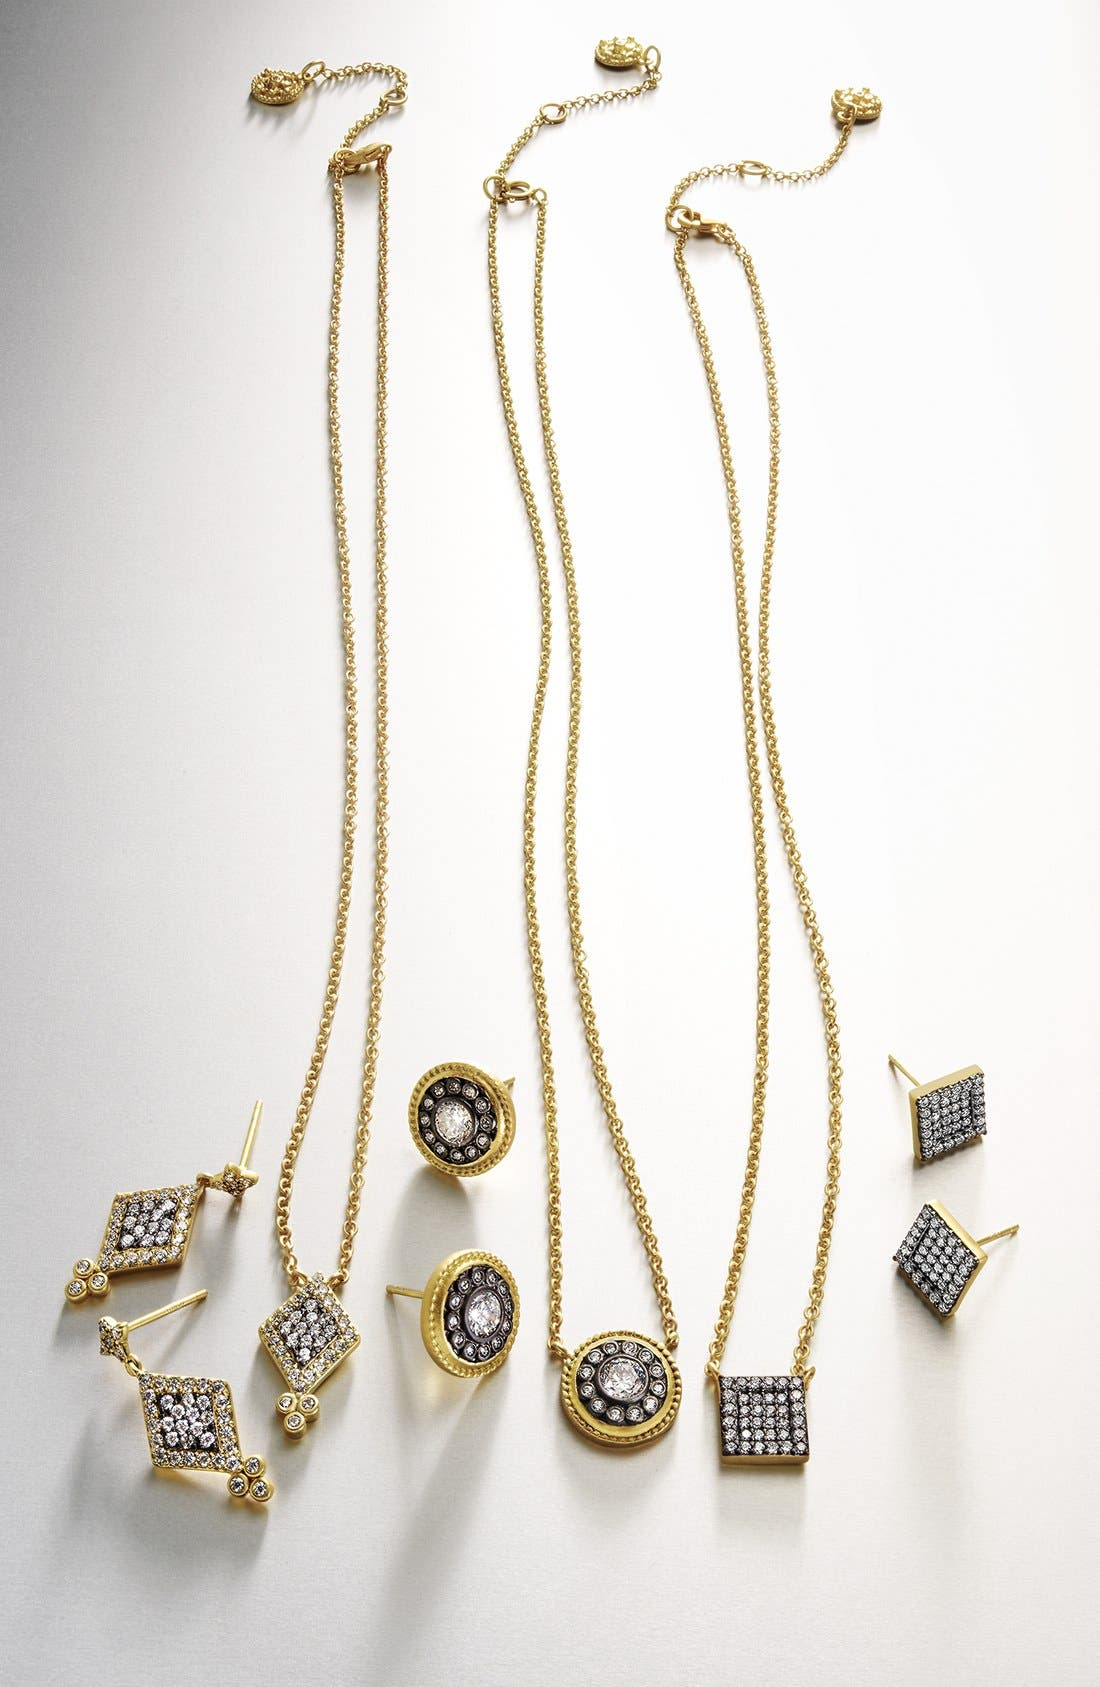 'Hamptons' Nautical Button Pendant Necklace,                             Alternate thumbnail 5, color,                             GOLD/ GUNMETAL